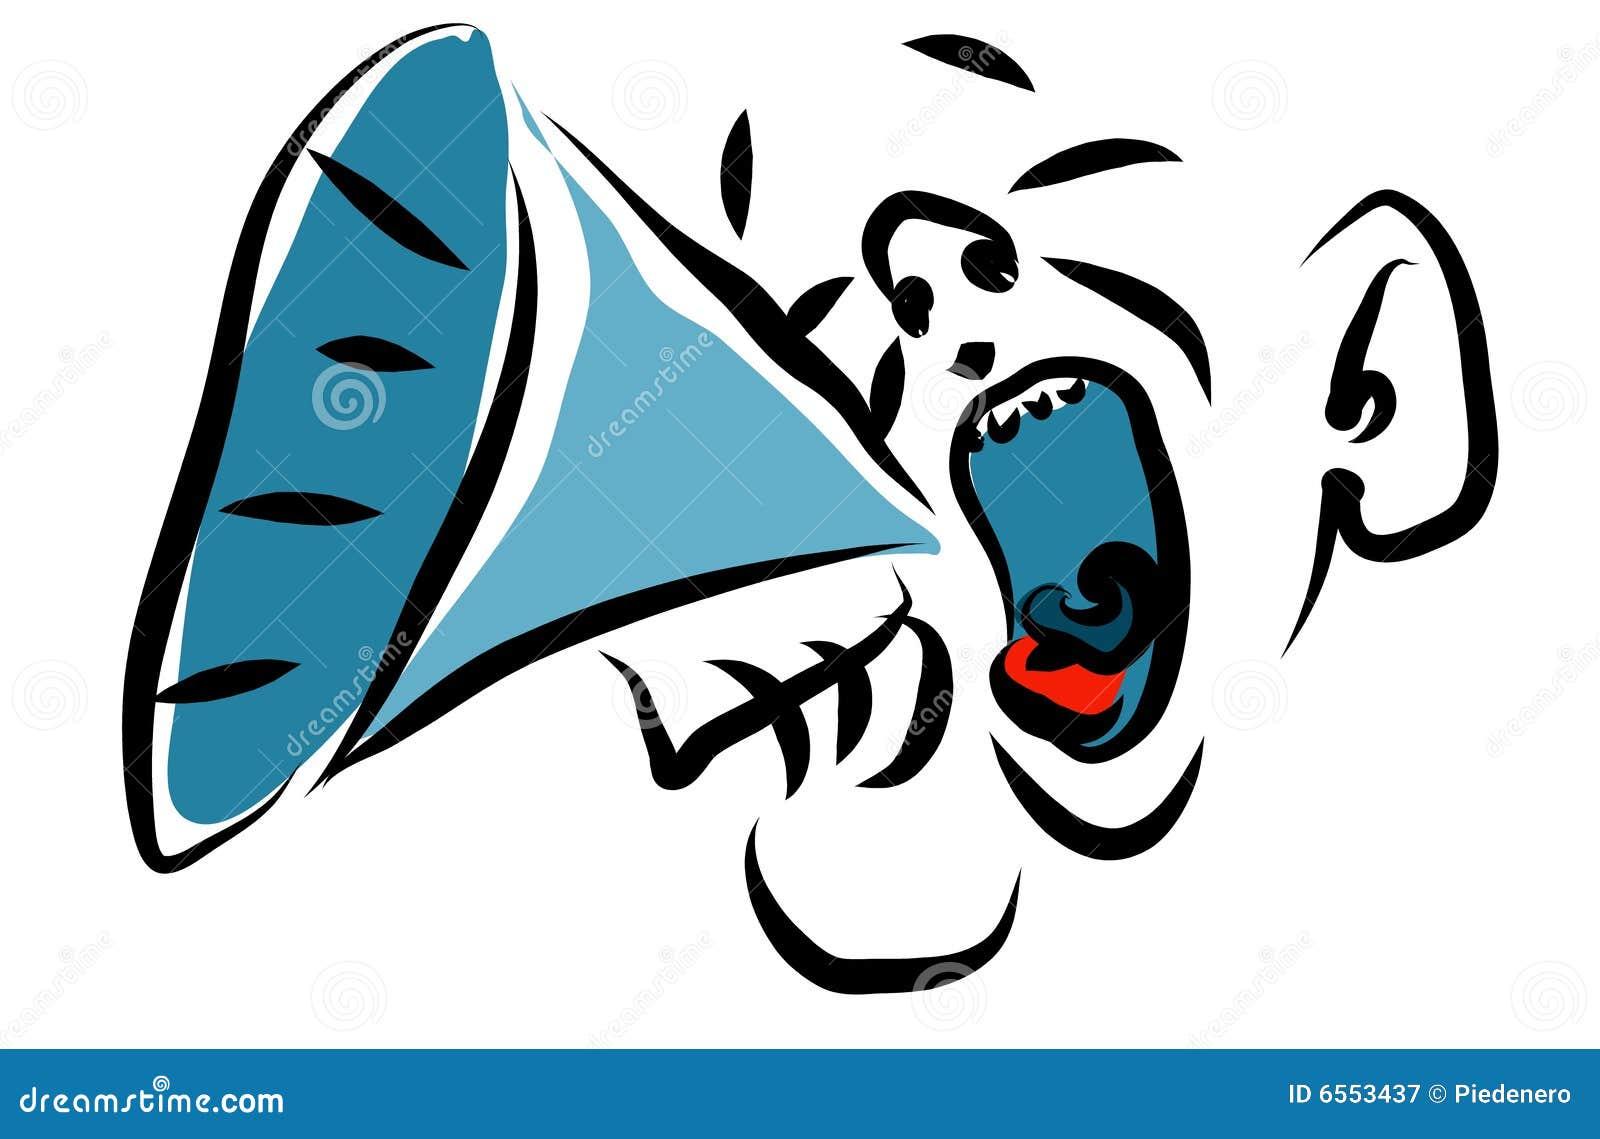 S And B Filters >> 尖叫 库存例证. 插画 包括有 蓝绿色, 推动, 金额, 舌头, 视觉, 茄子, 爆聚, 扩音机, 蓝色, 大声 ...